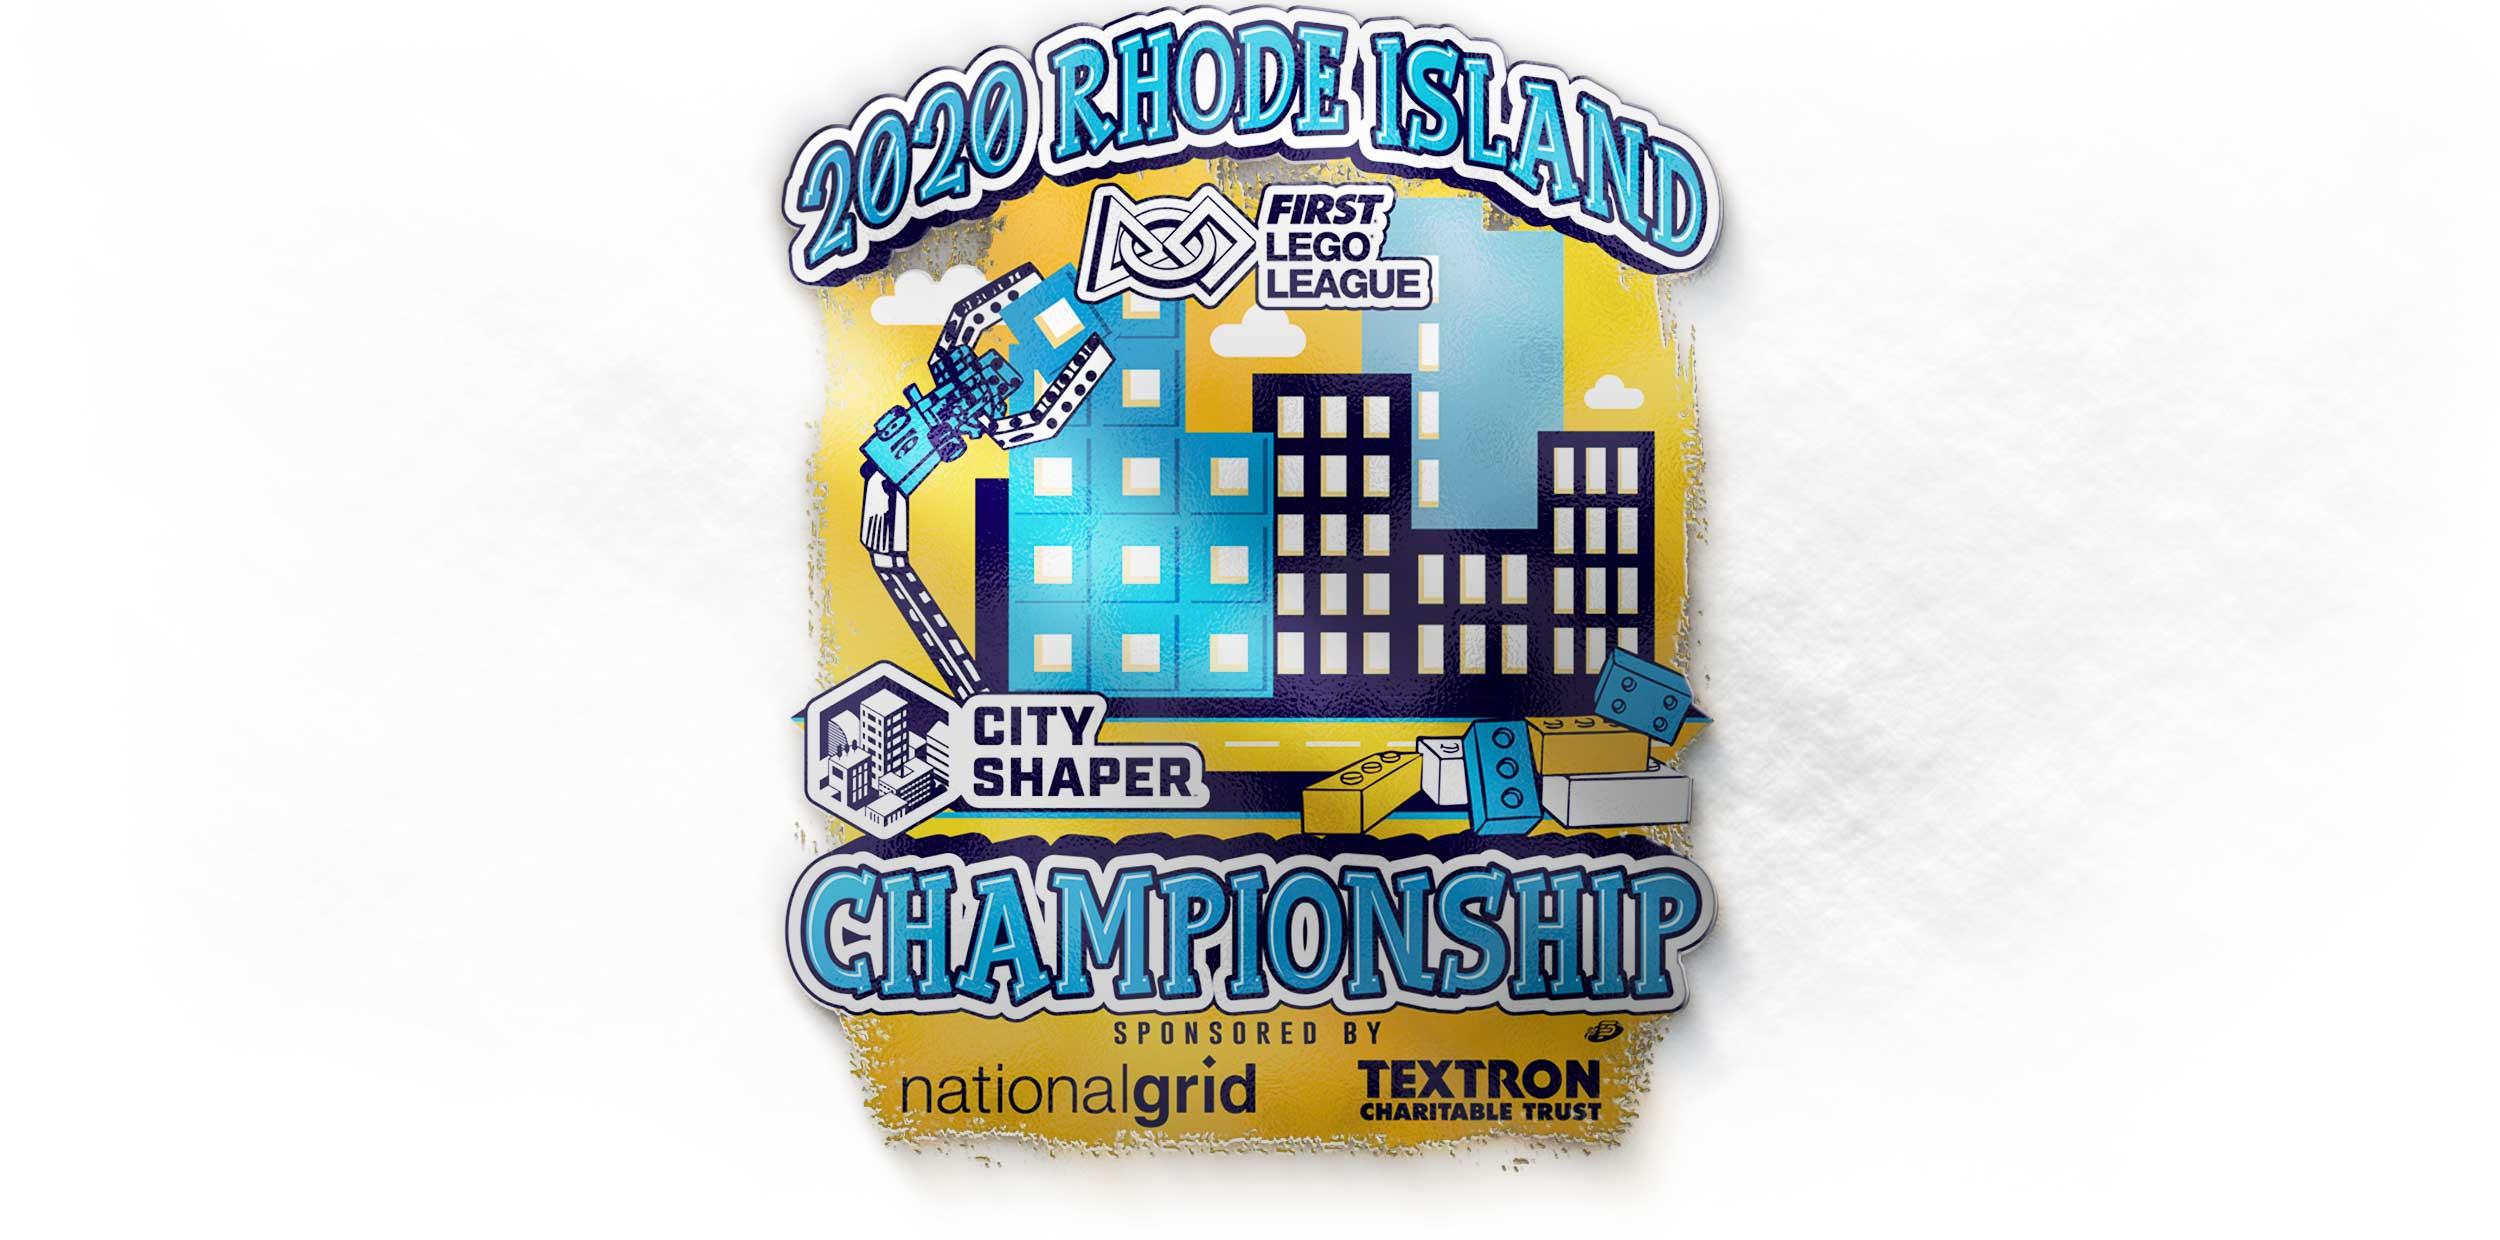 Rhode-Island-First-Championship-Fine-Designs-Apparel